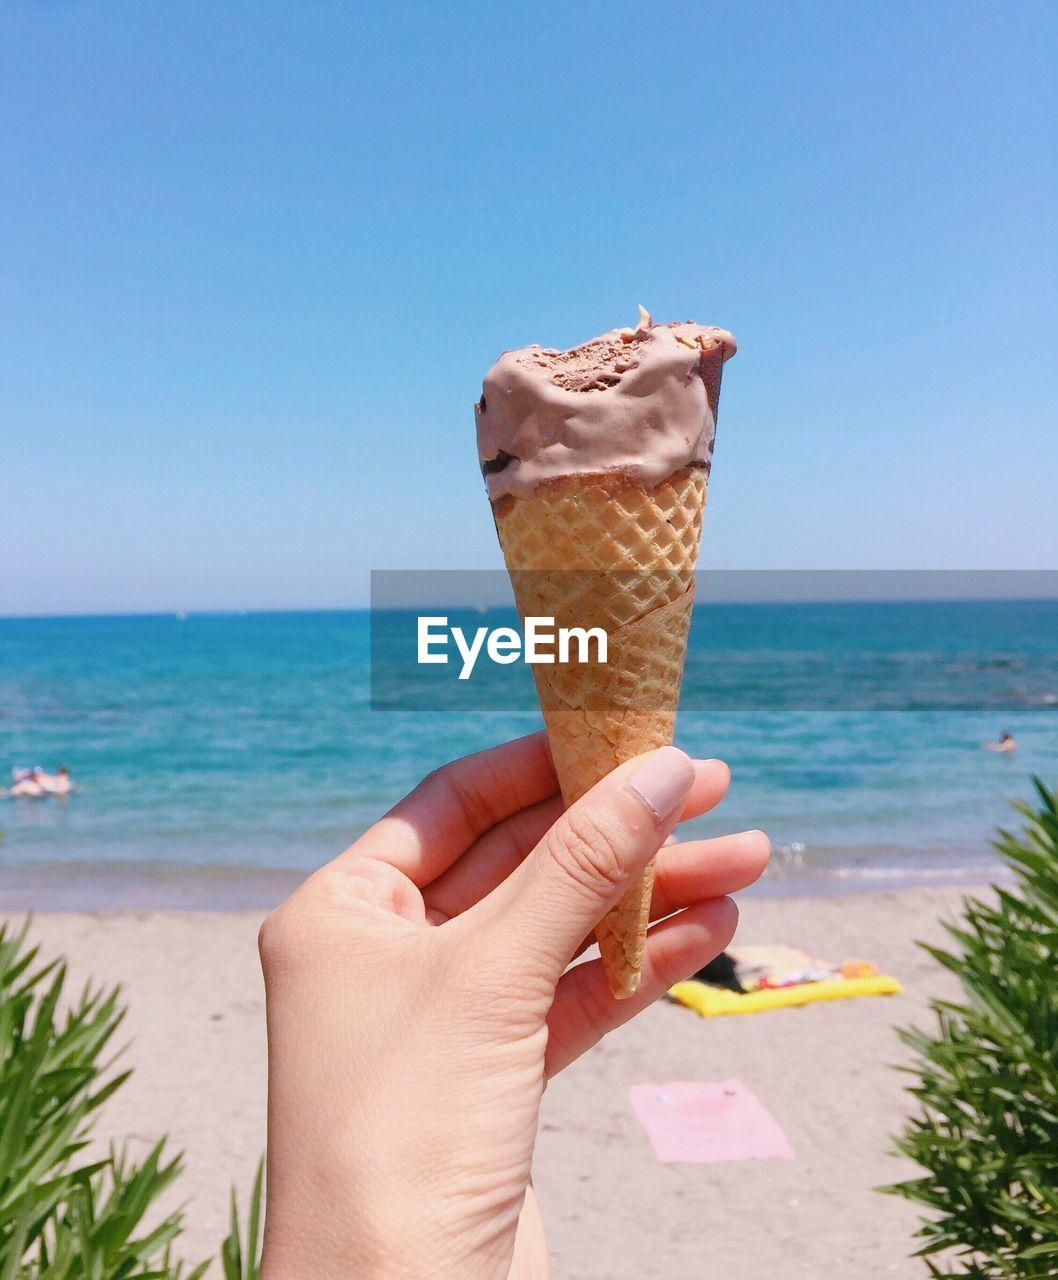 CLOSE-UP OF HAND HOLDING ICE CREAM ON BEACH